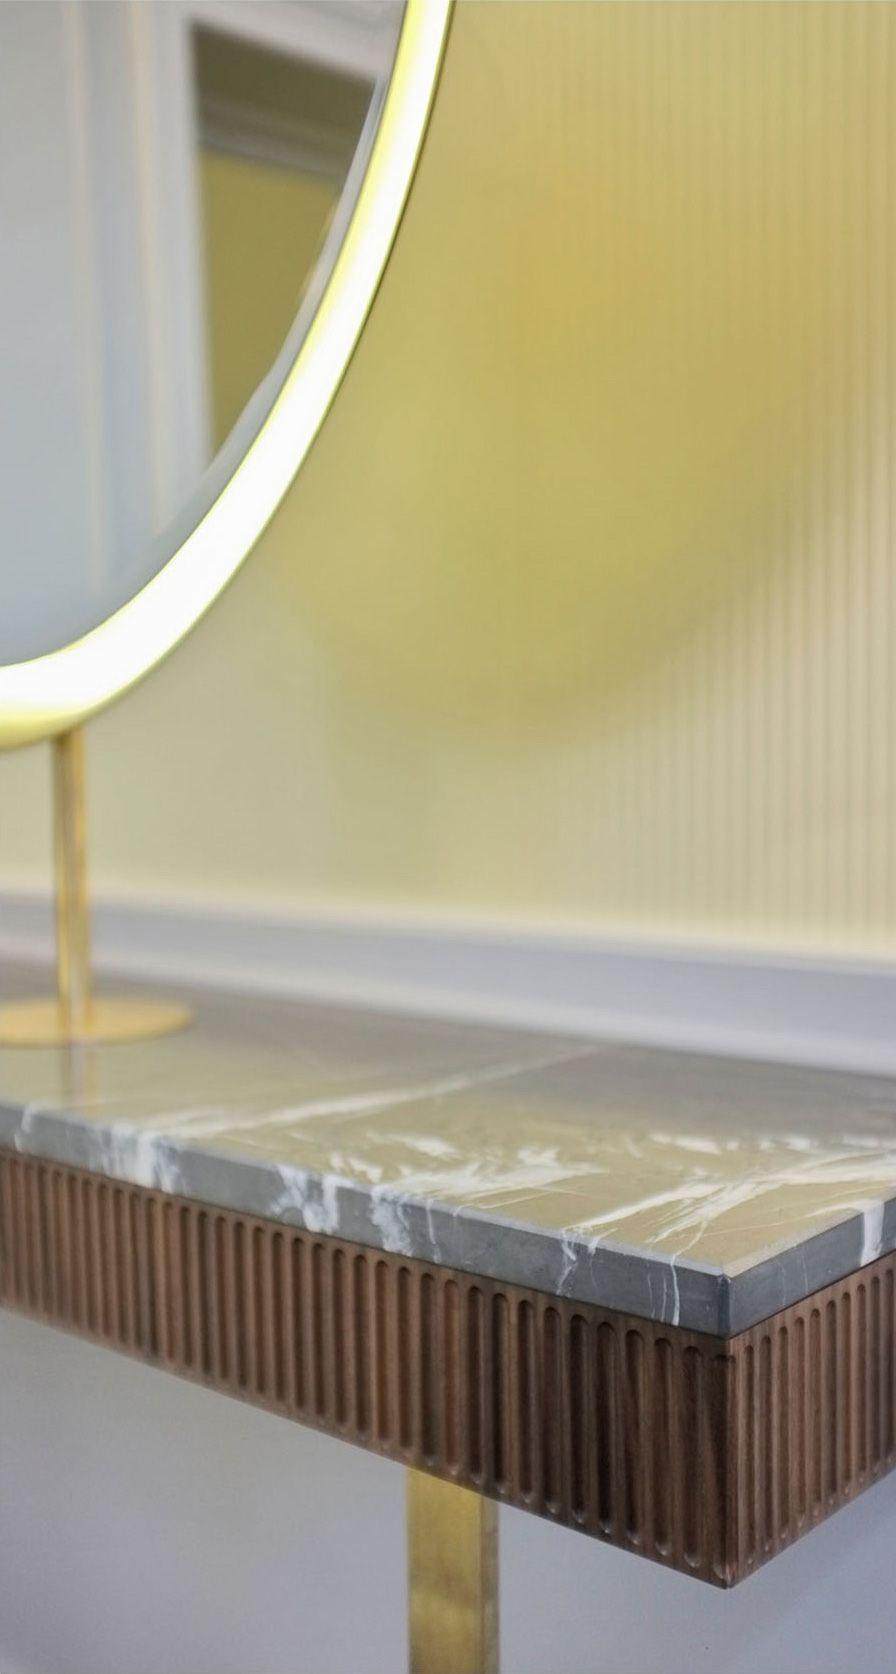 Detalles en textura incluso los materiales dise ar for Mobili di design a basso costo